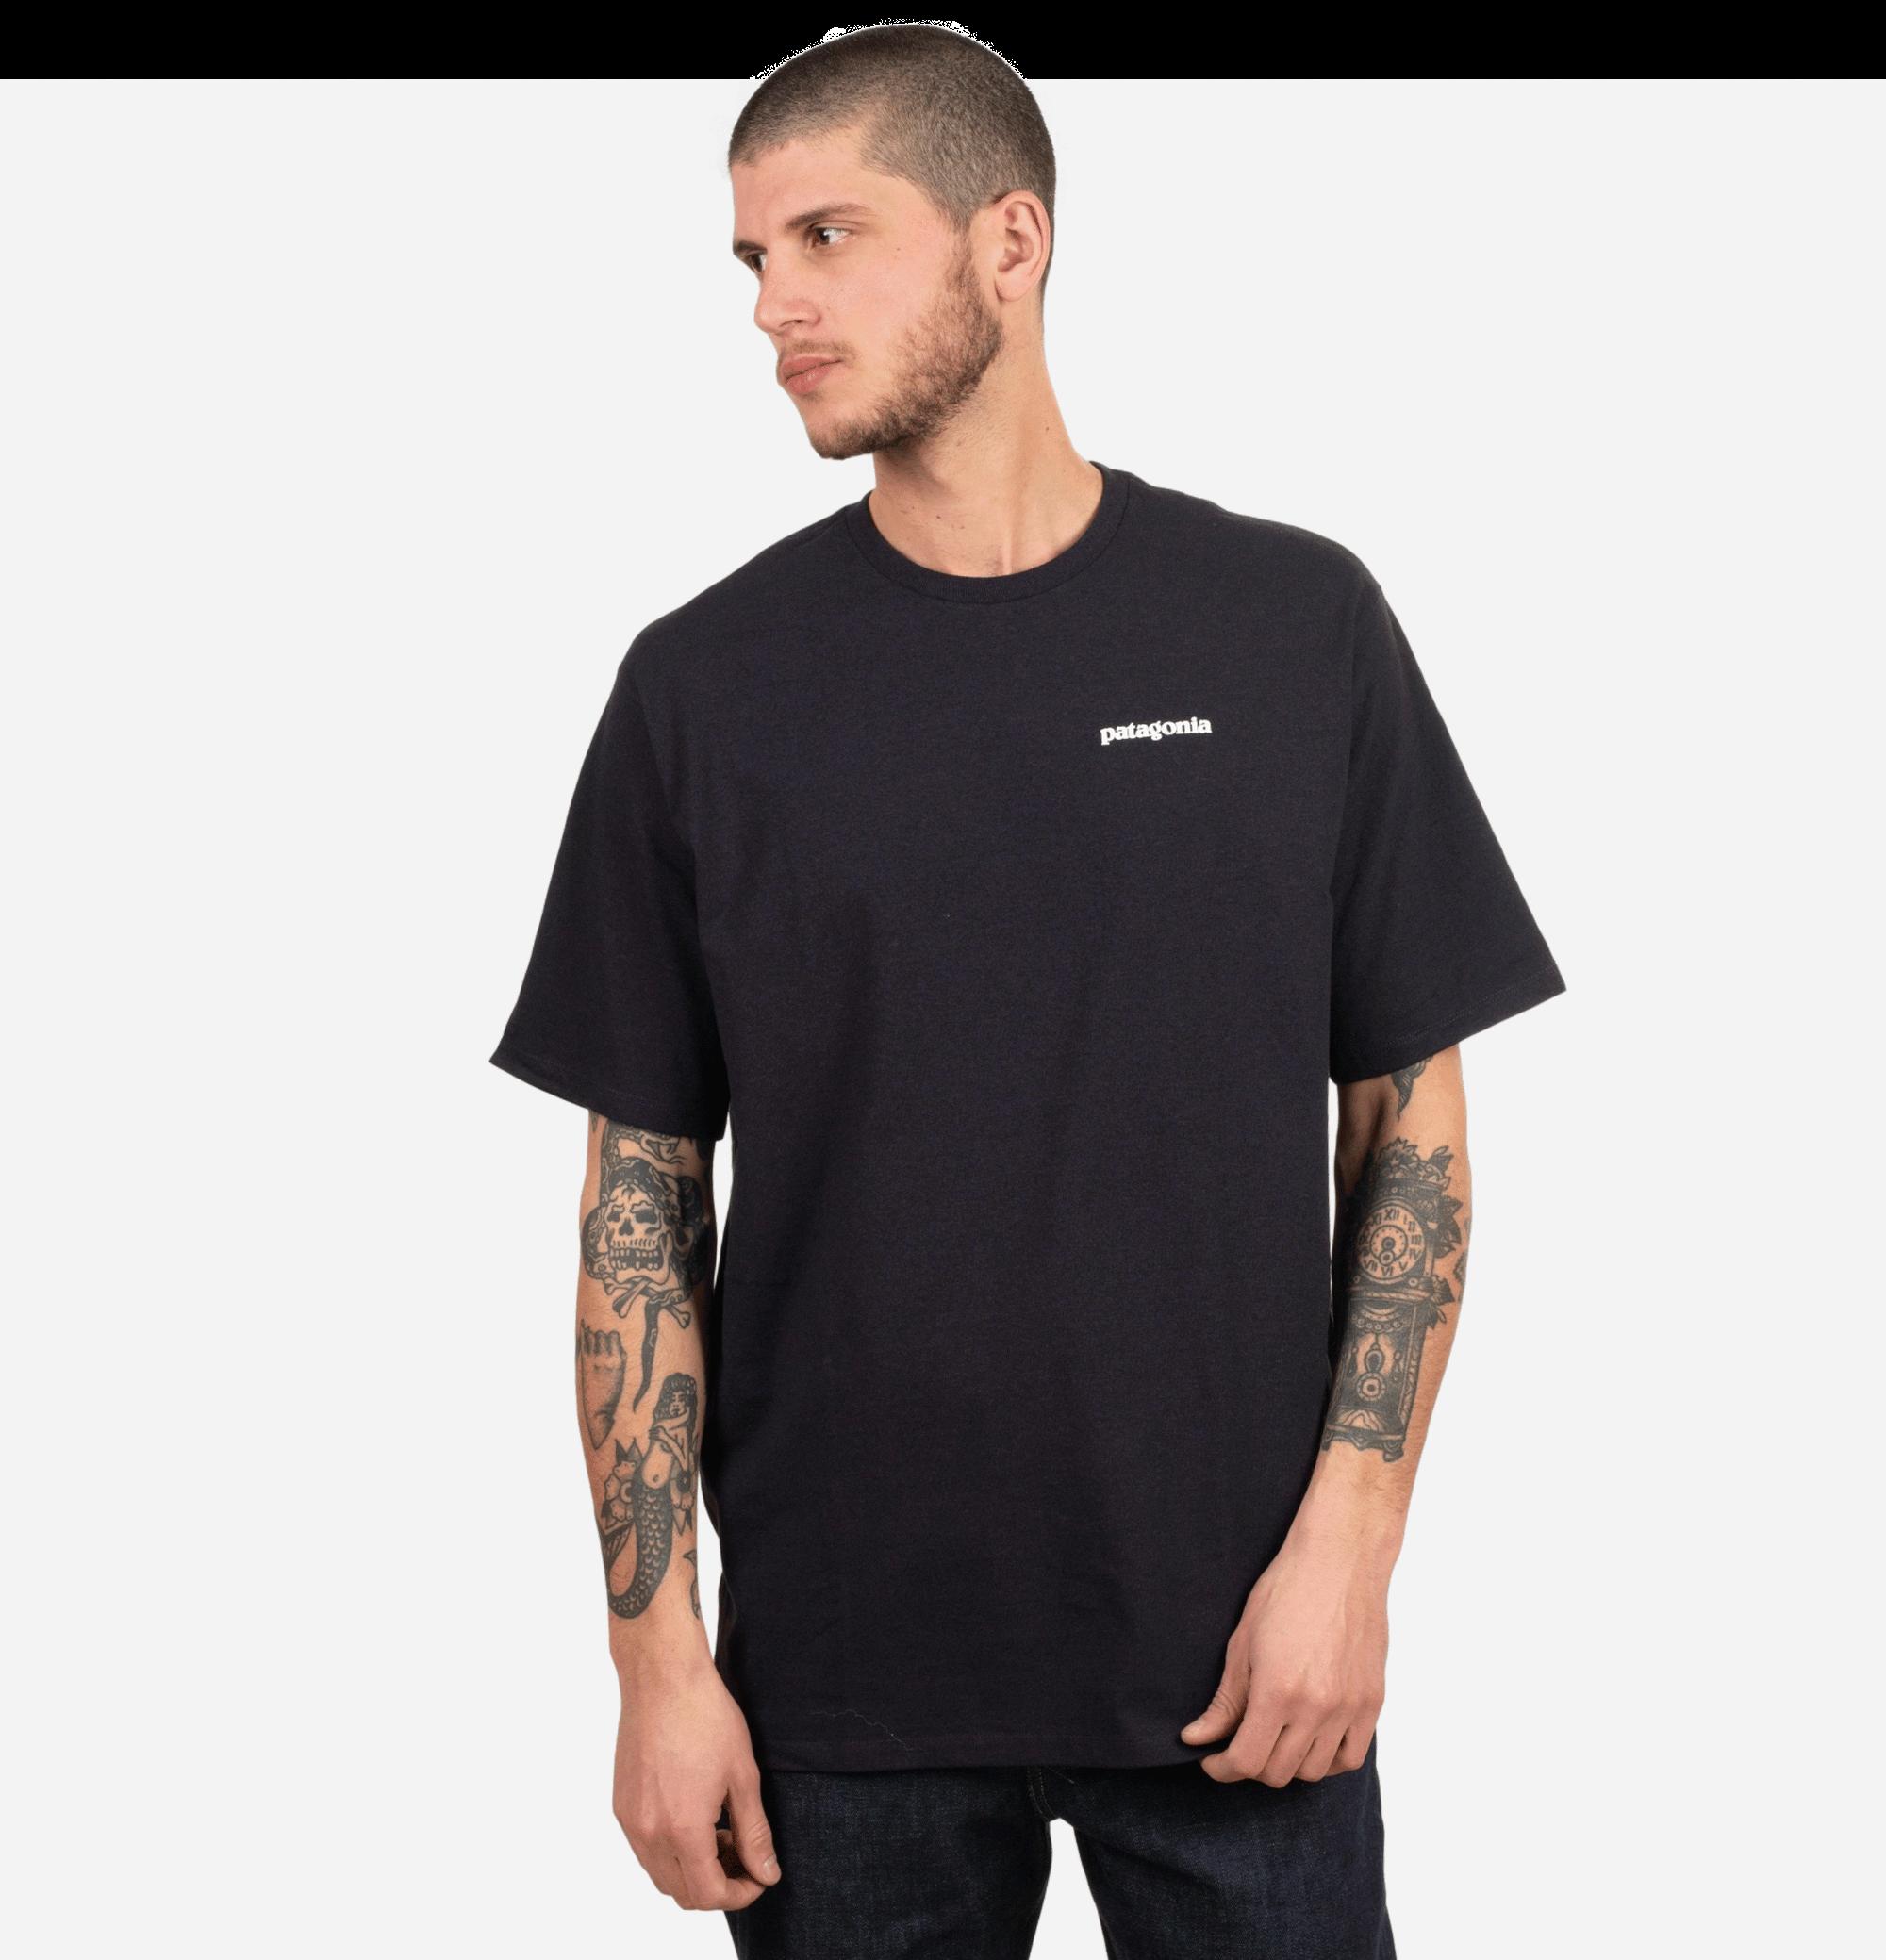 P6 Logo T-shirt Black